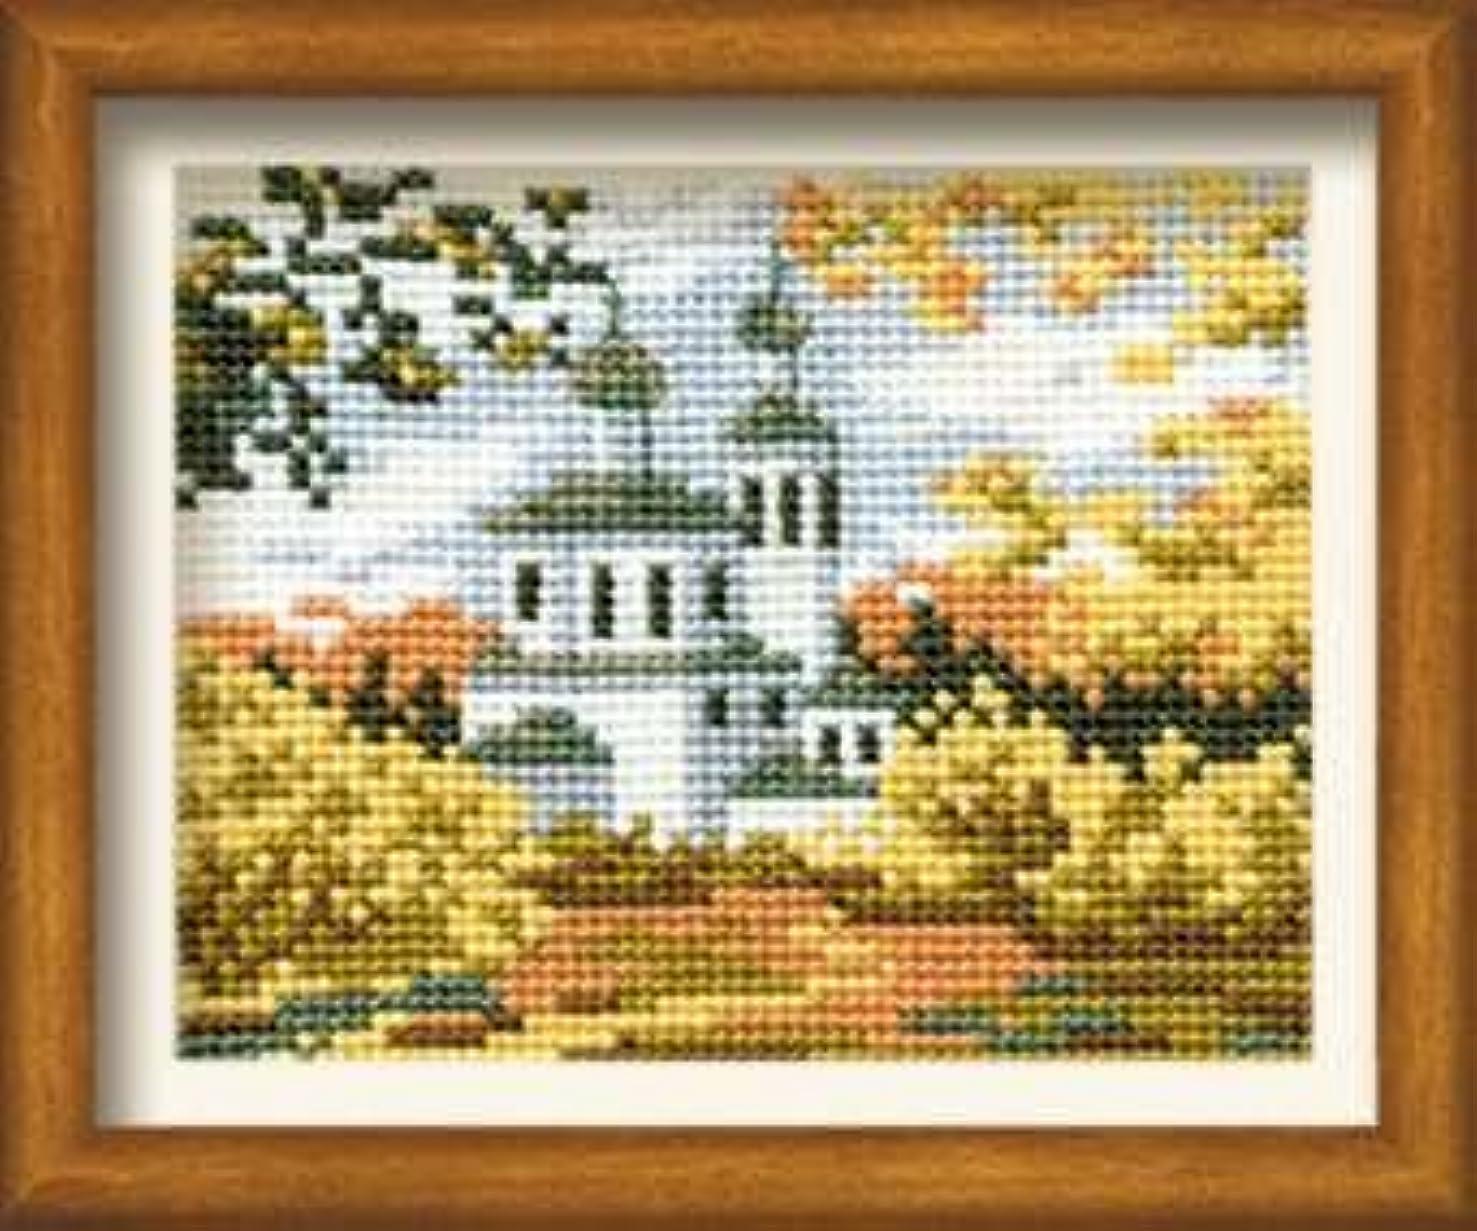 RIOLIS 631 - Autumn - Counted Cross Stitch Kit - 6